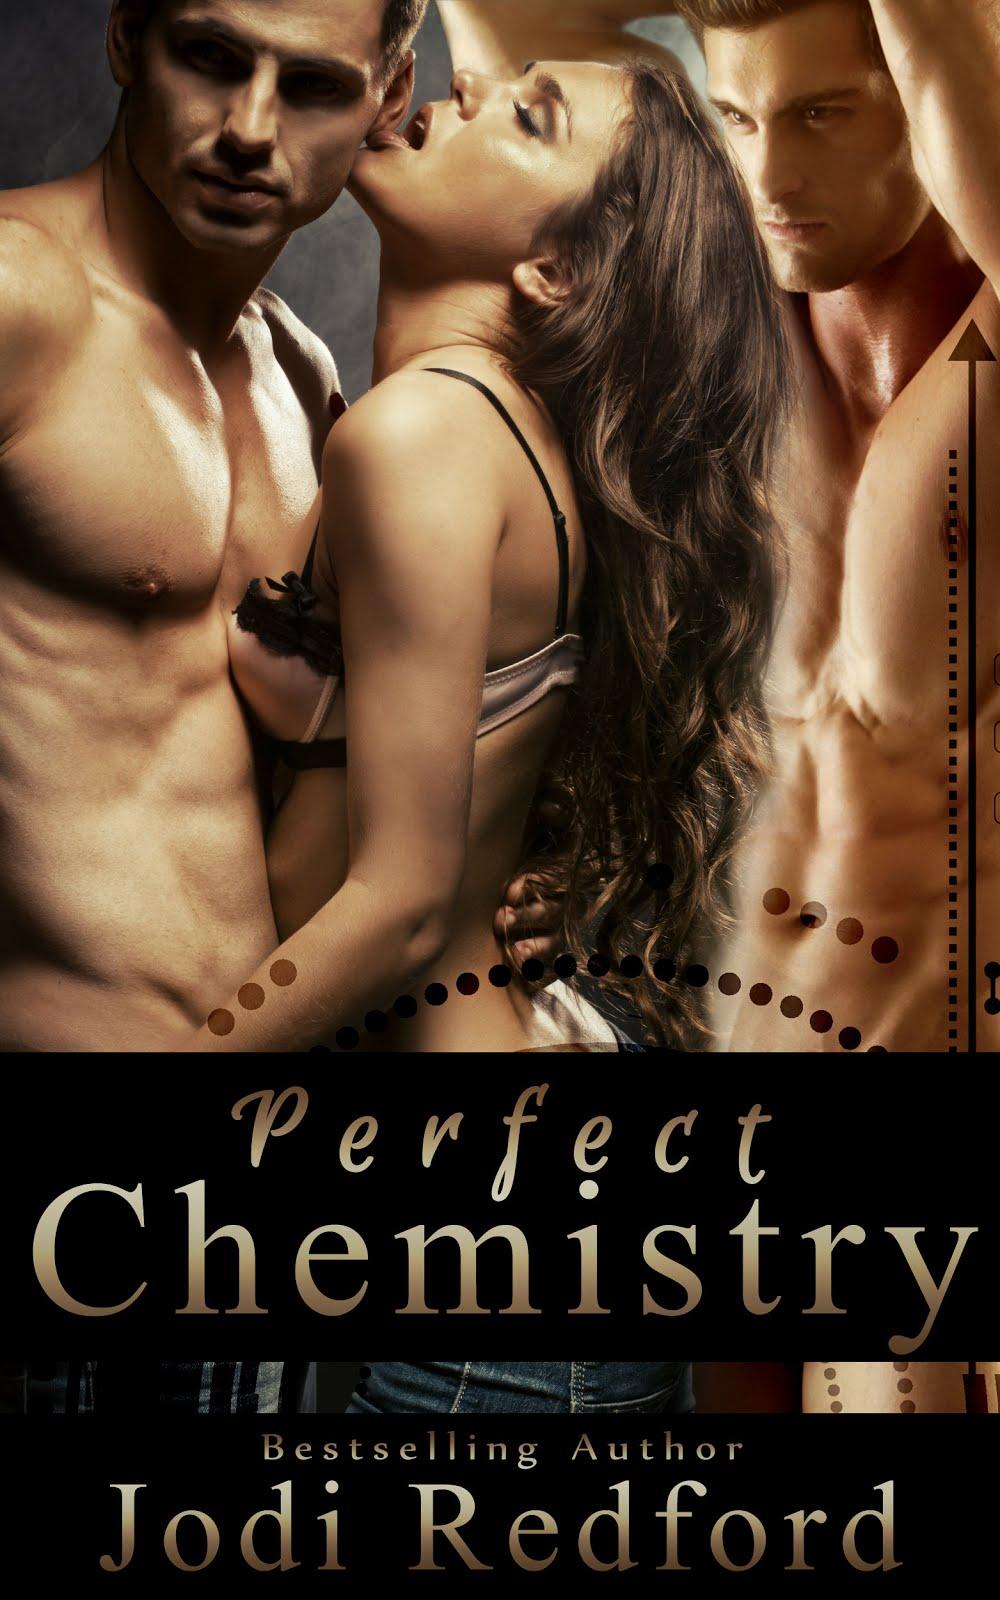 Perfect-Chemistry03.jpg